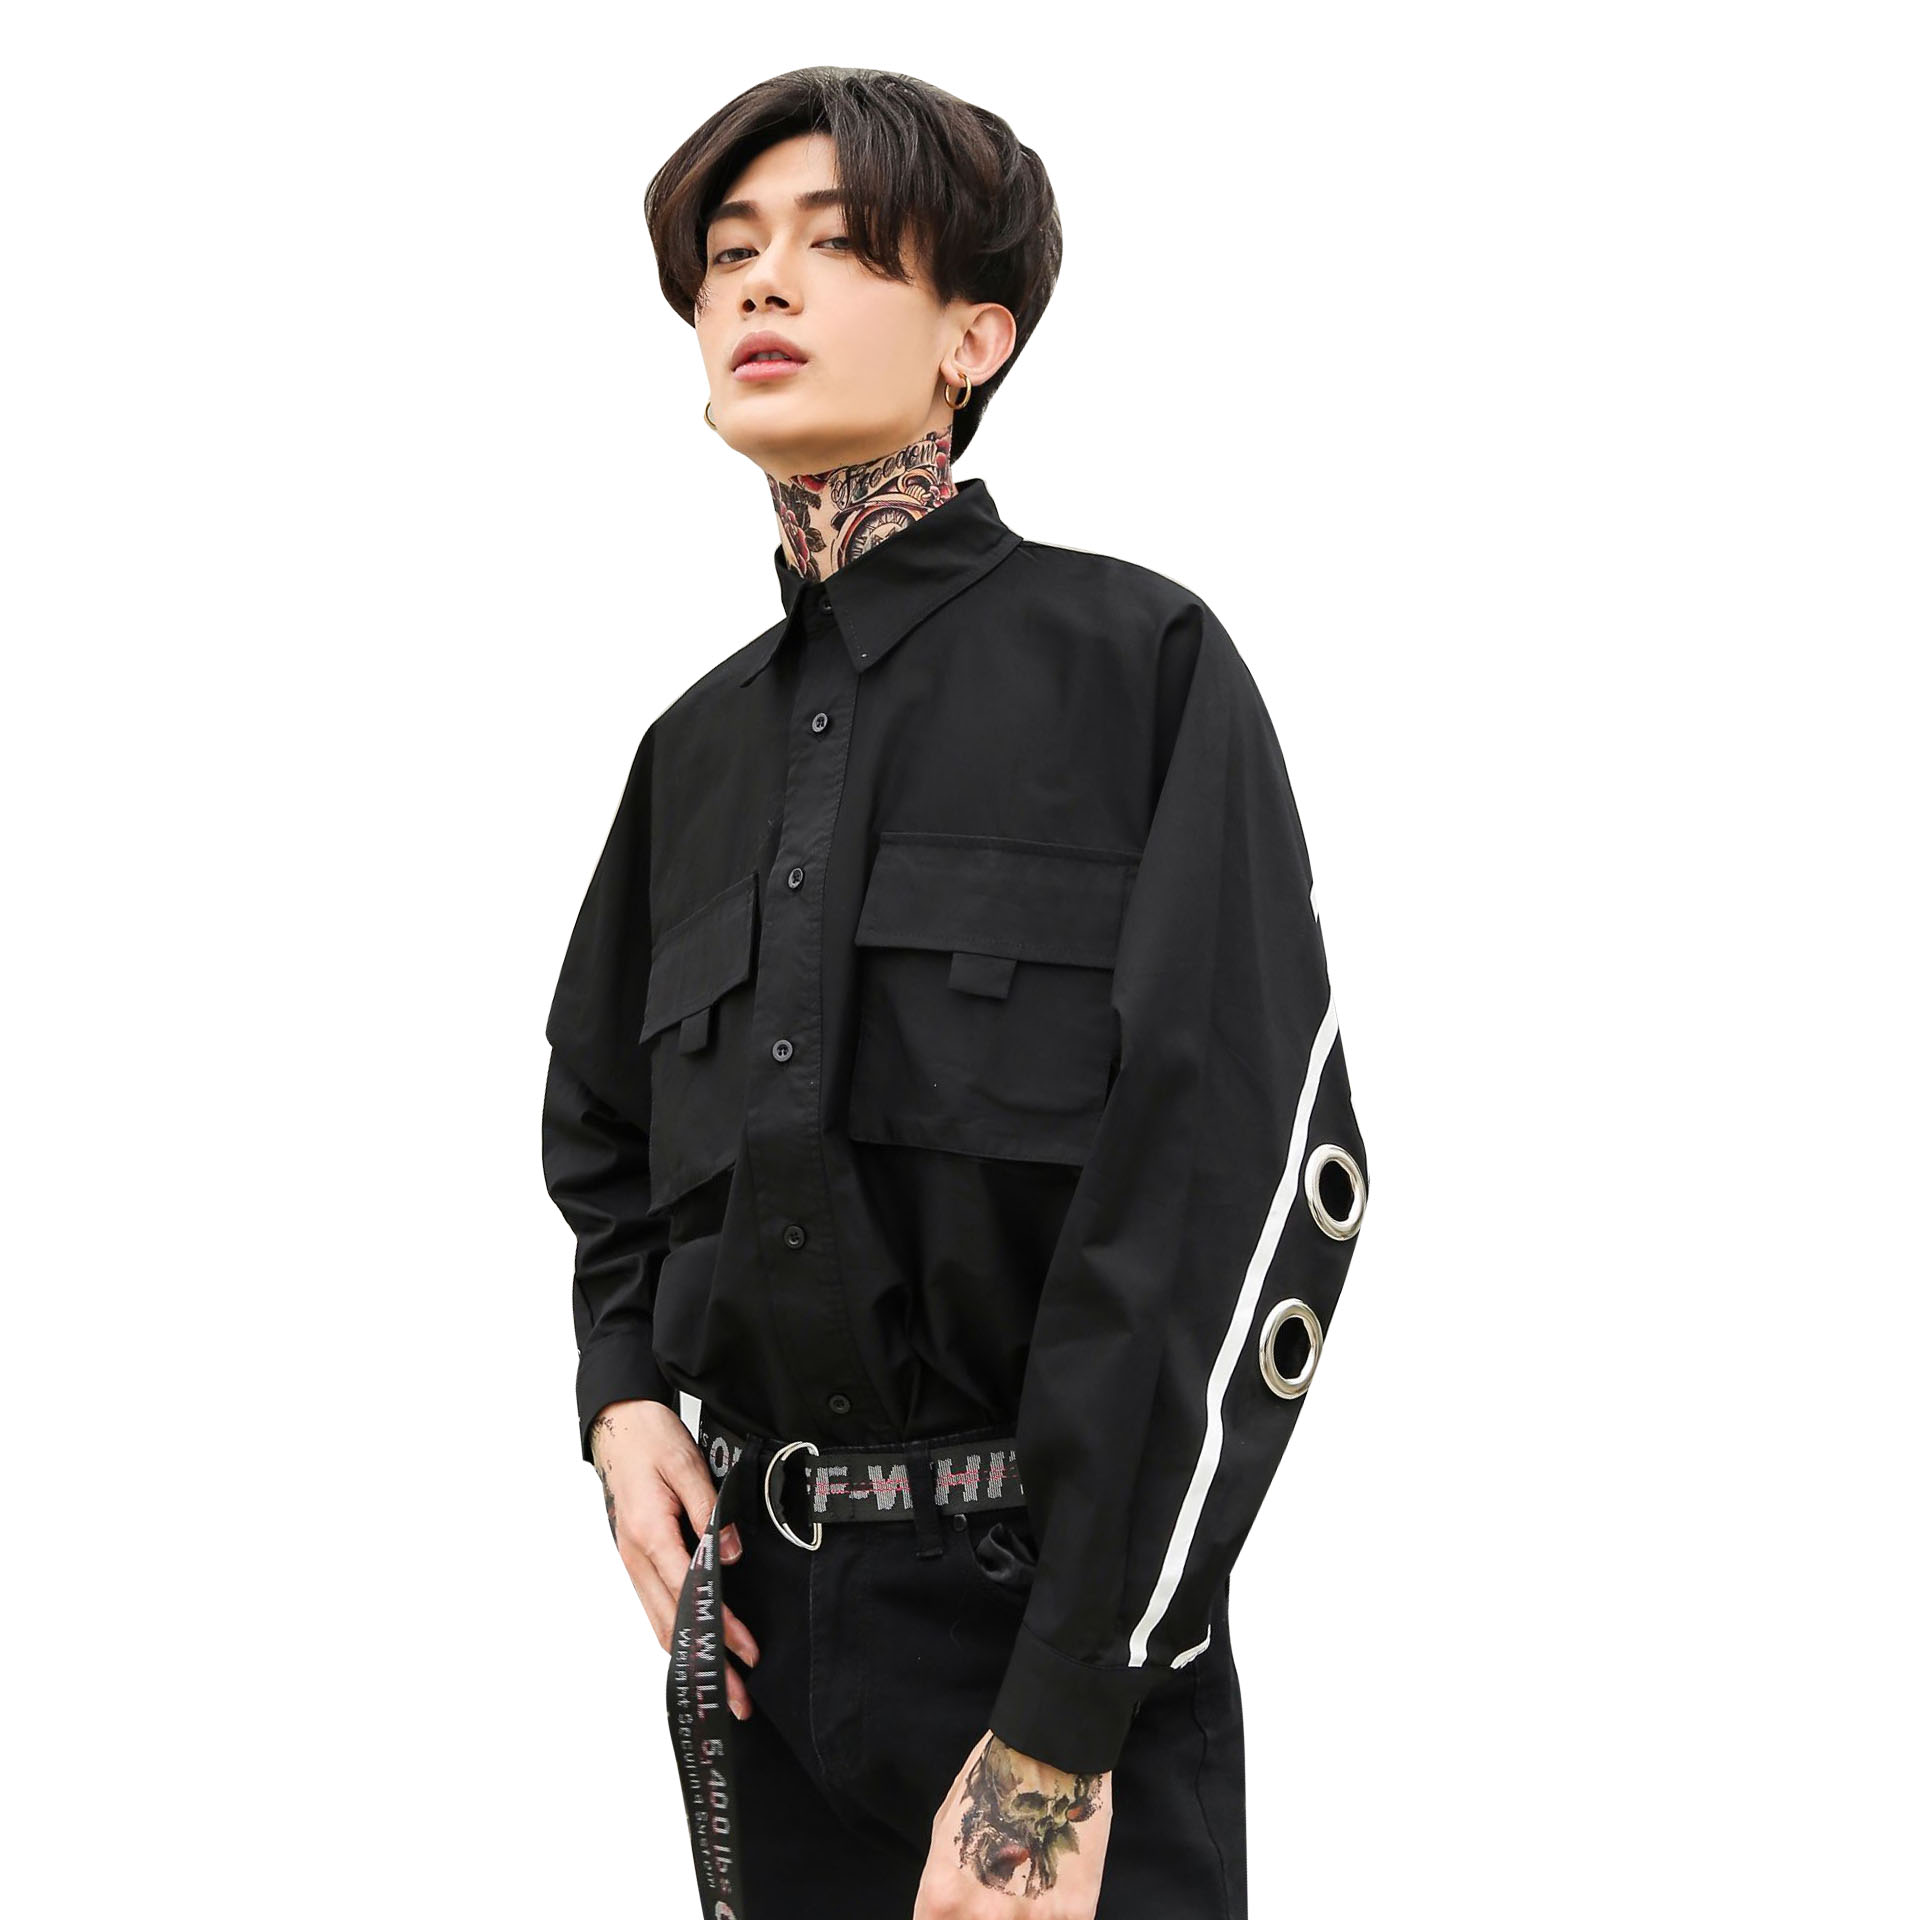 Man Rivet Iron Ring Hollow Bat Long Sleeve Shirt Male High Street Fashion Hip Hop Punk Loose Casual Dress Shirt Stage Costumes